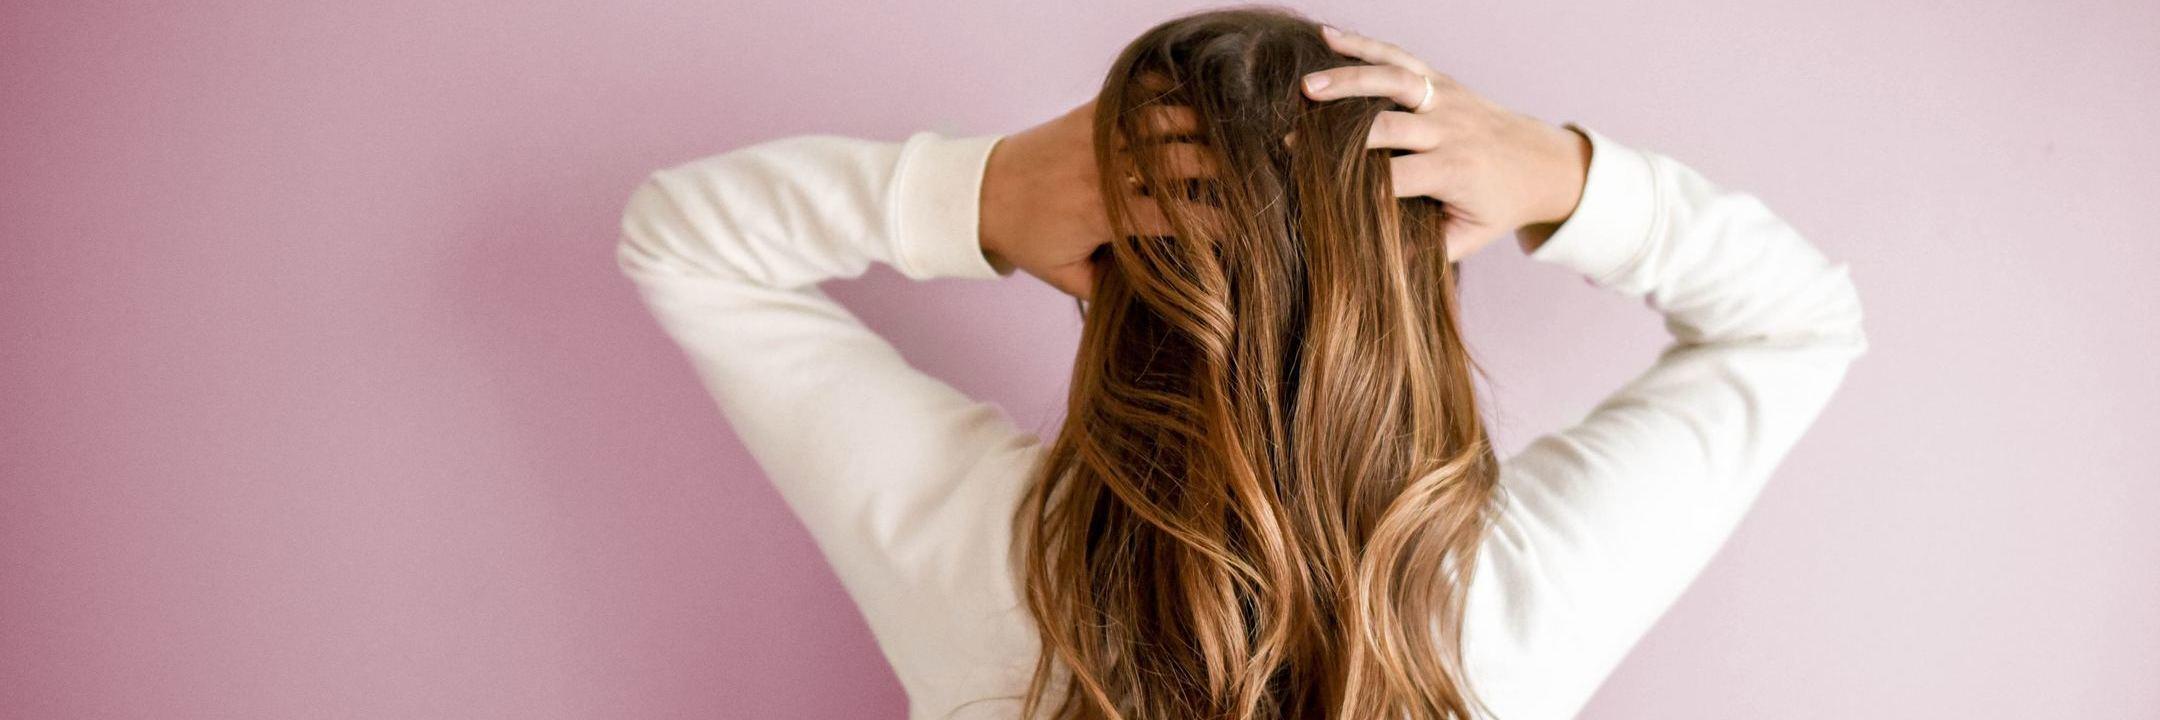 Descubra o novo ritual para o seu cabelo neste passatempo!